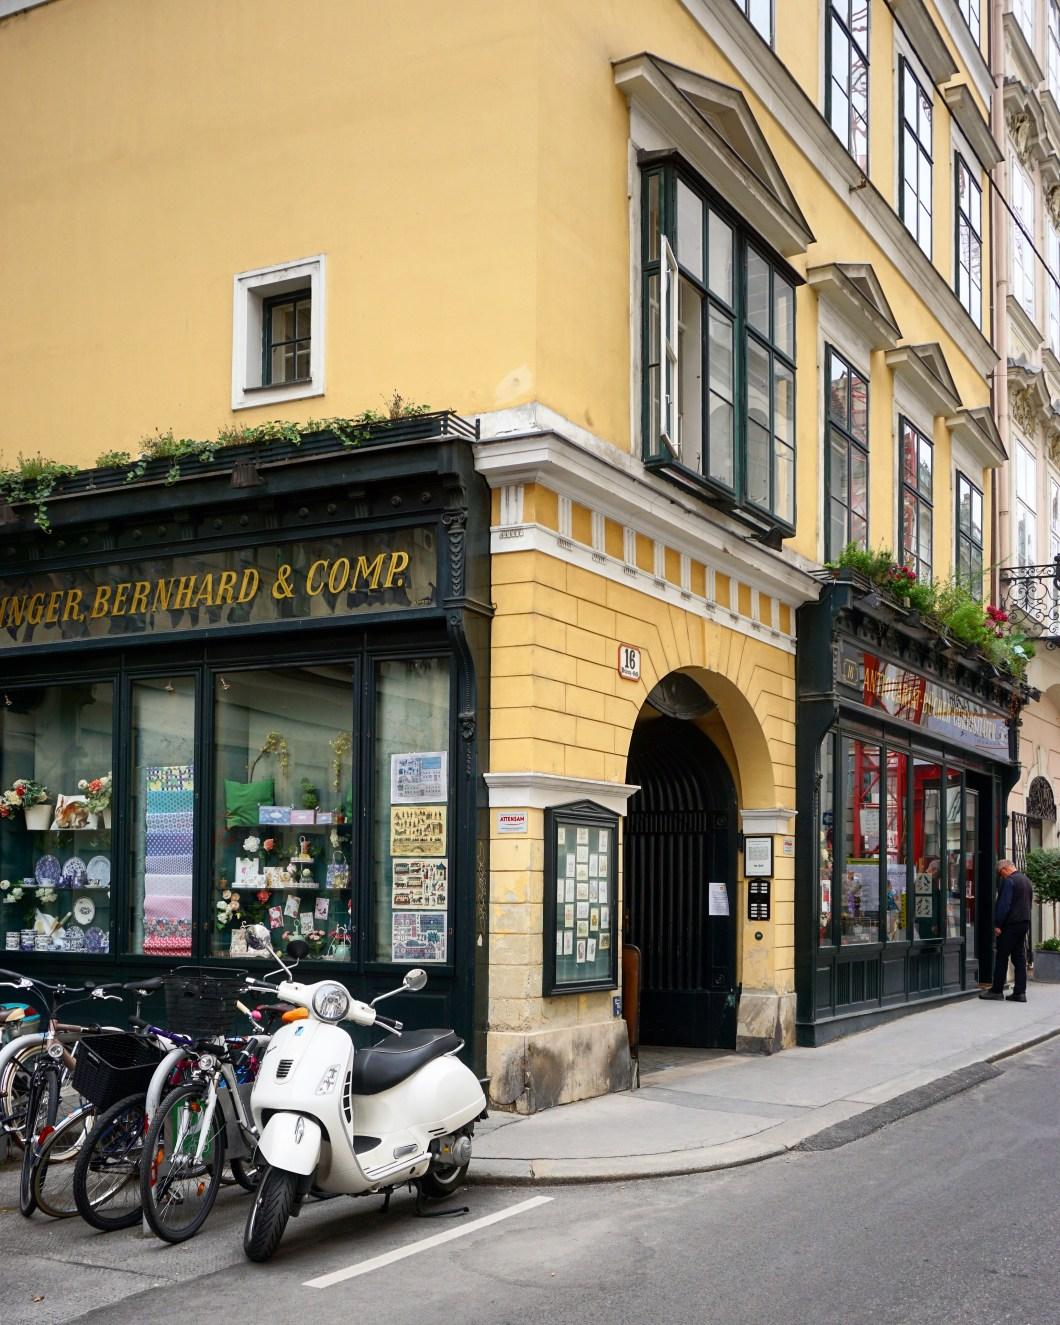 Visiter Vienne en un week end